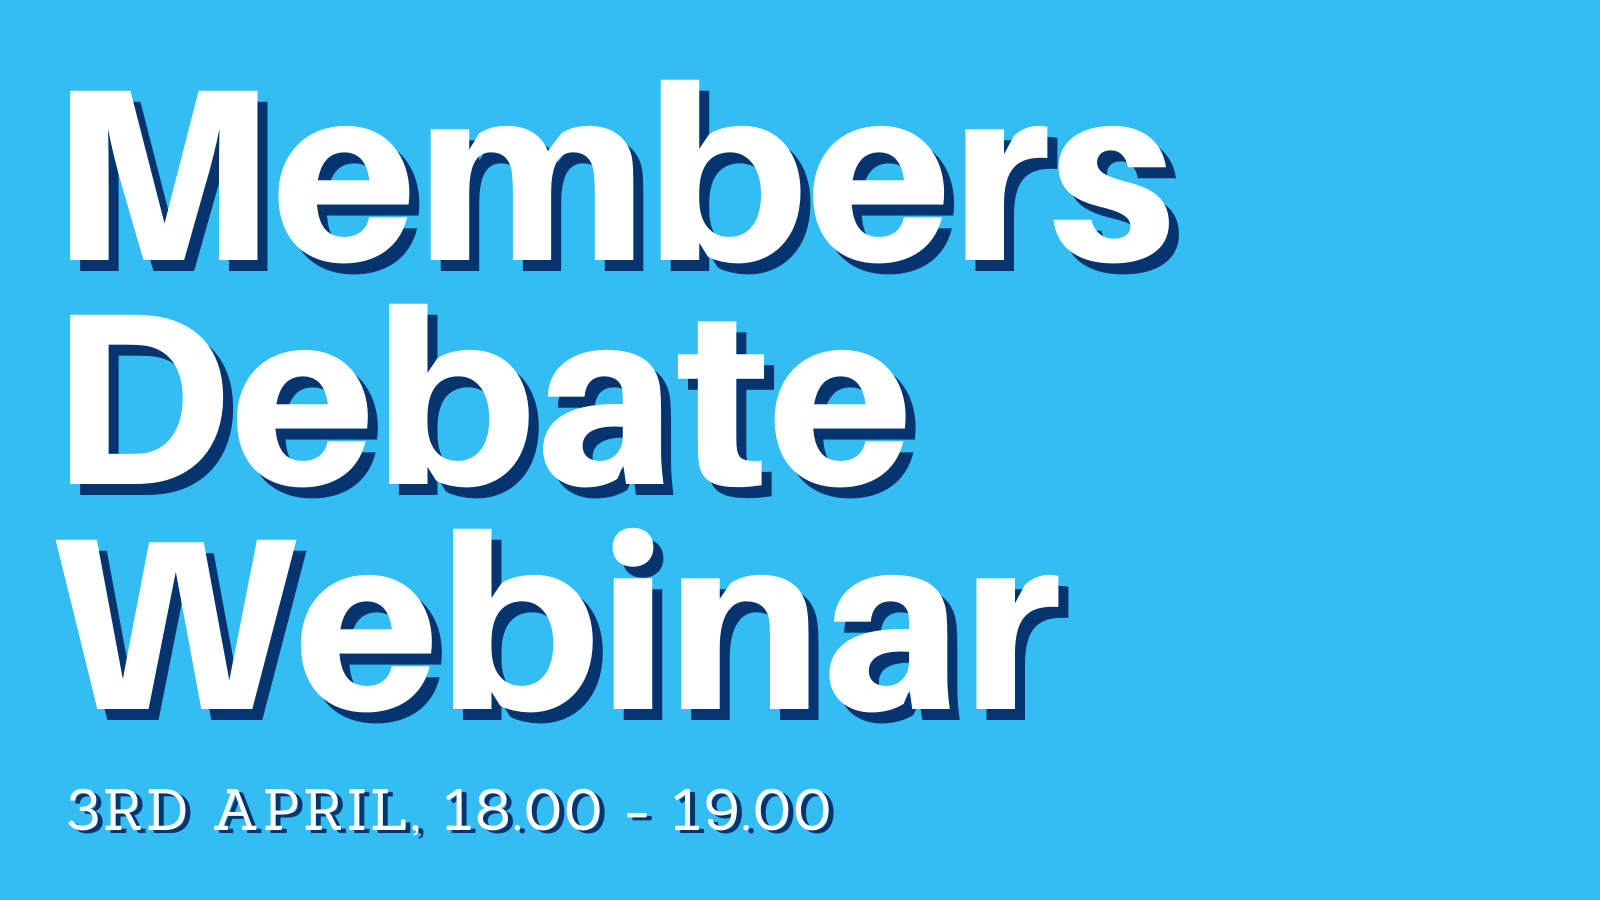 Members Debate Webinar